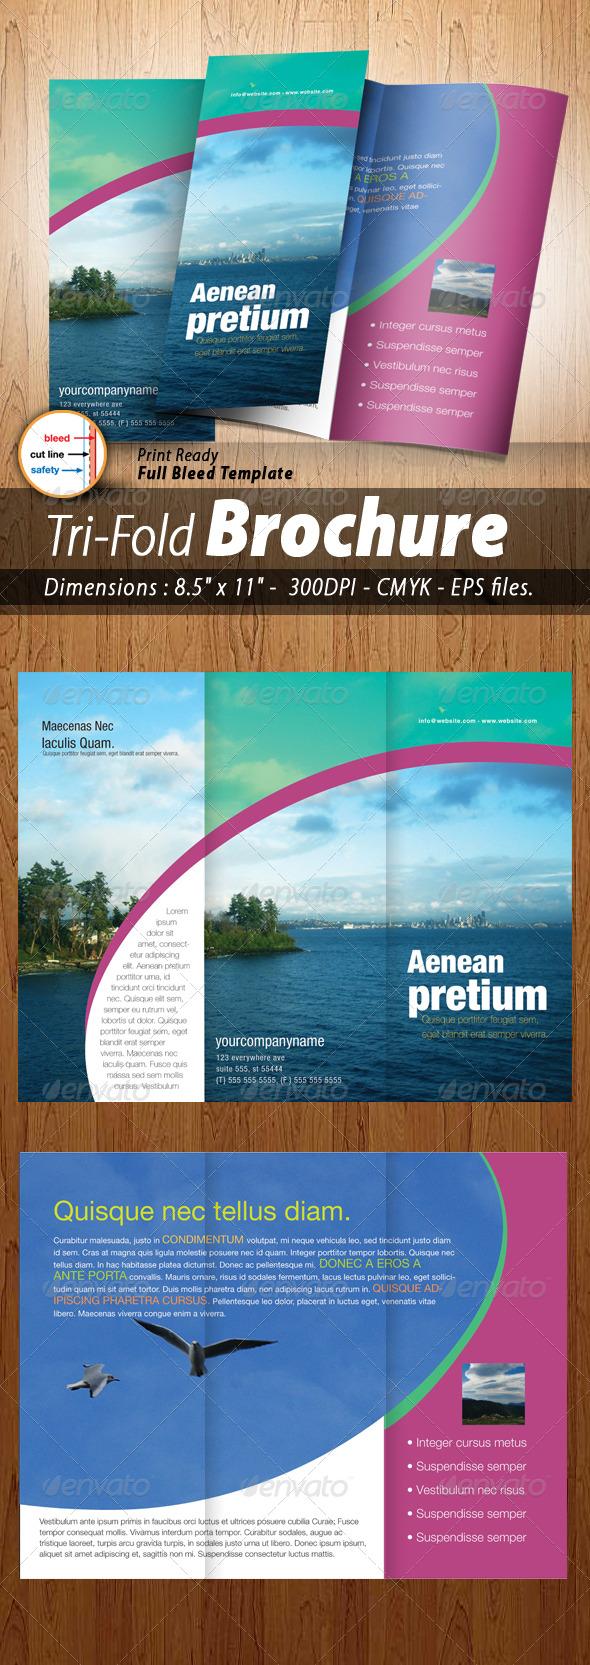 Aenean Tri-fold Brochure  - Corporate Brochures